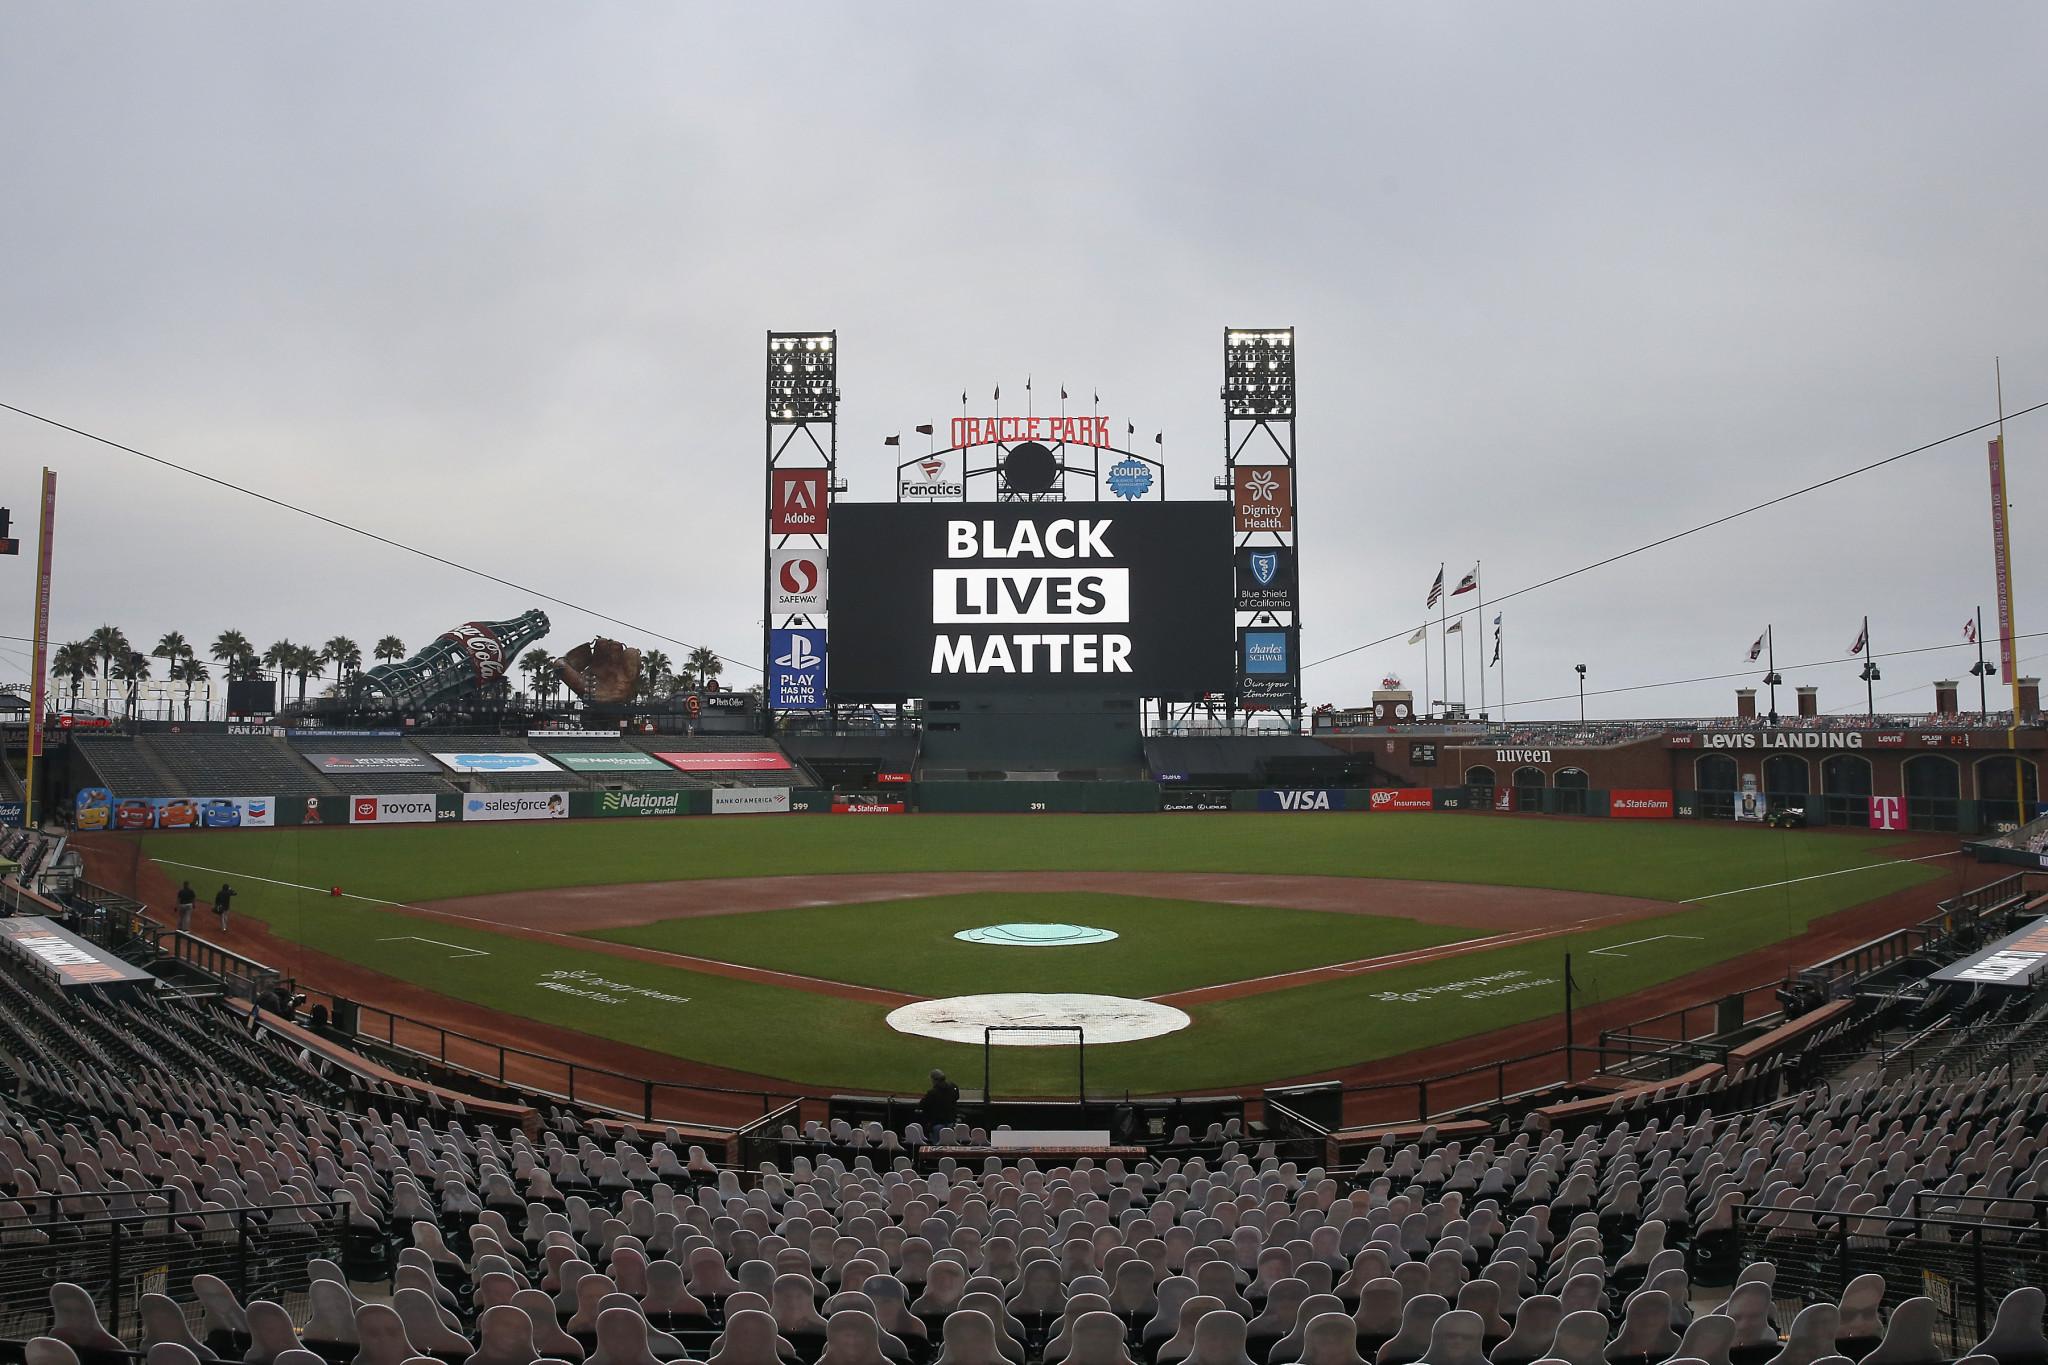 Bucks-led player boycotts spread across US sport to protest Jacob Blake shooting